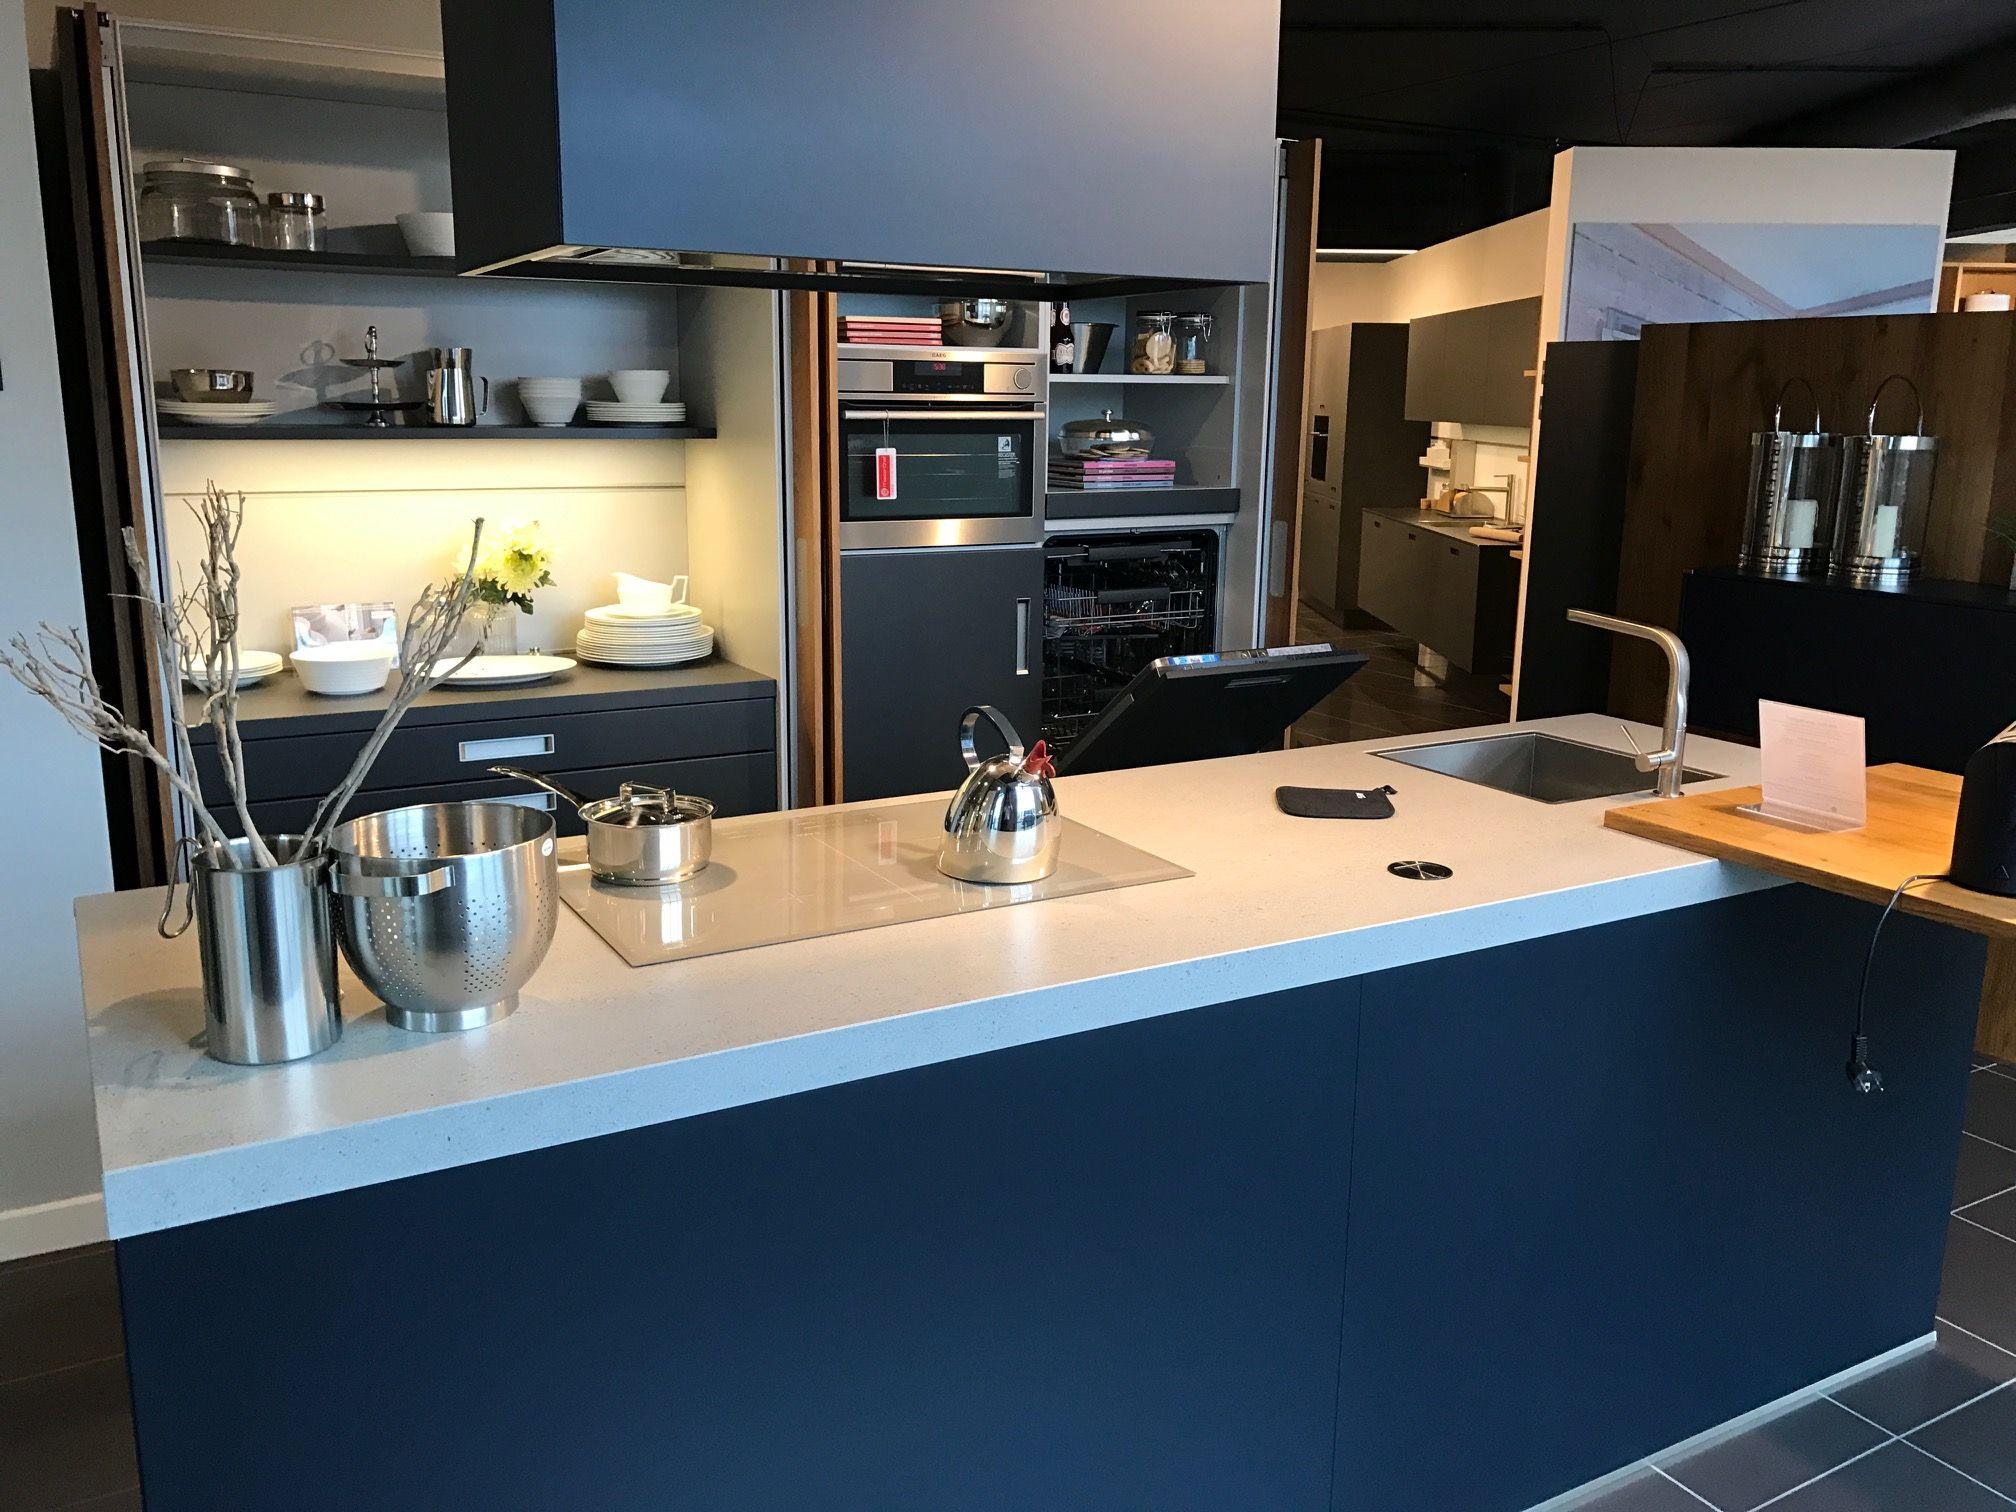 sch ller next 125 nx500 nx650 57068. Black Bedroom Furniture Sets. Home Design Ideas